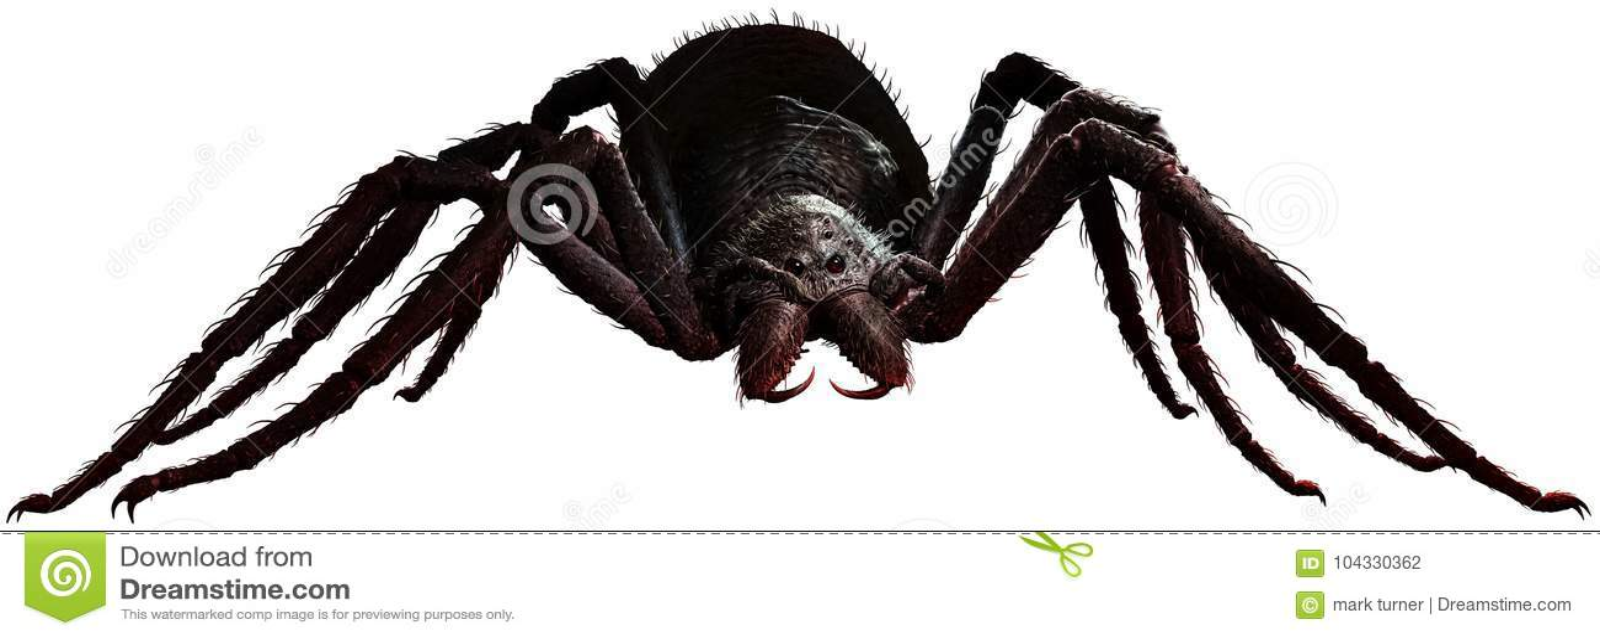 Riesige Illustration der Spinne 3D